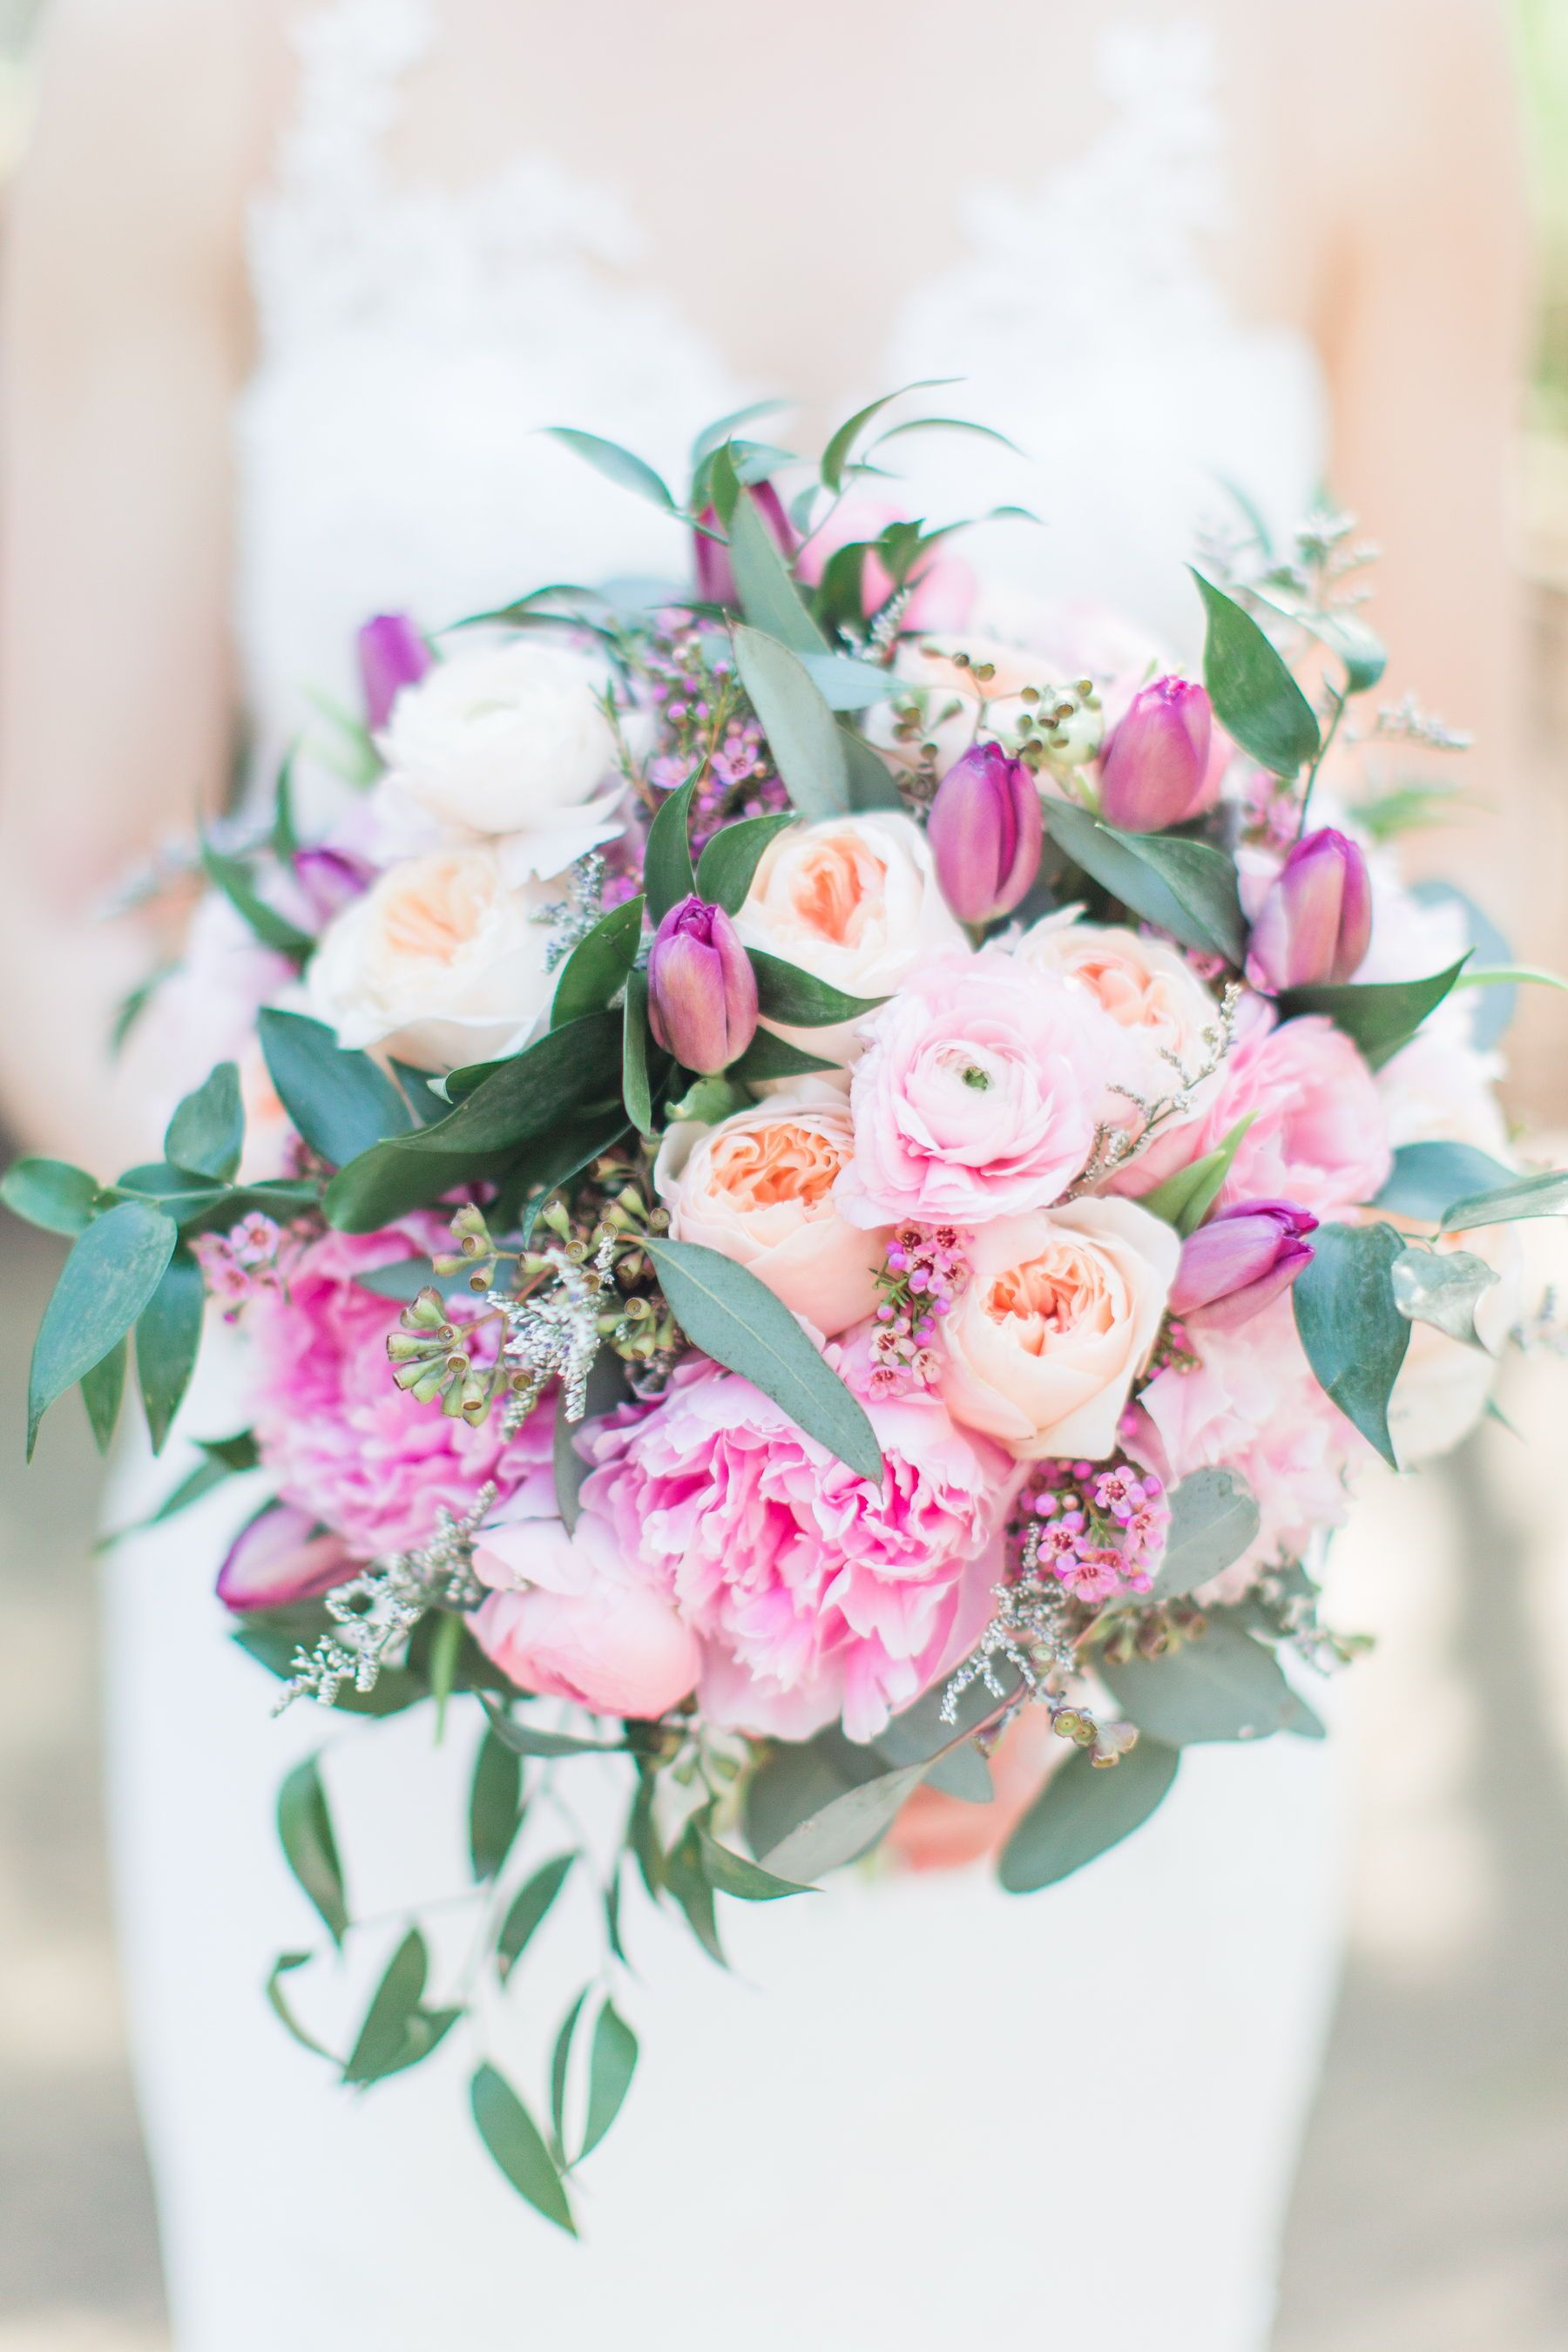 52 Ideas for Your Spring Wedding Bouquet Spring wedding